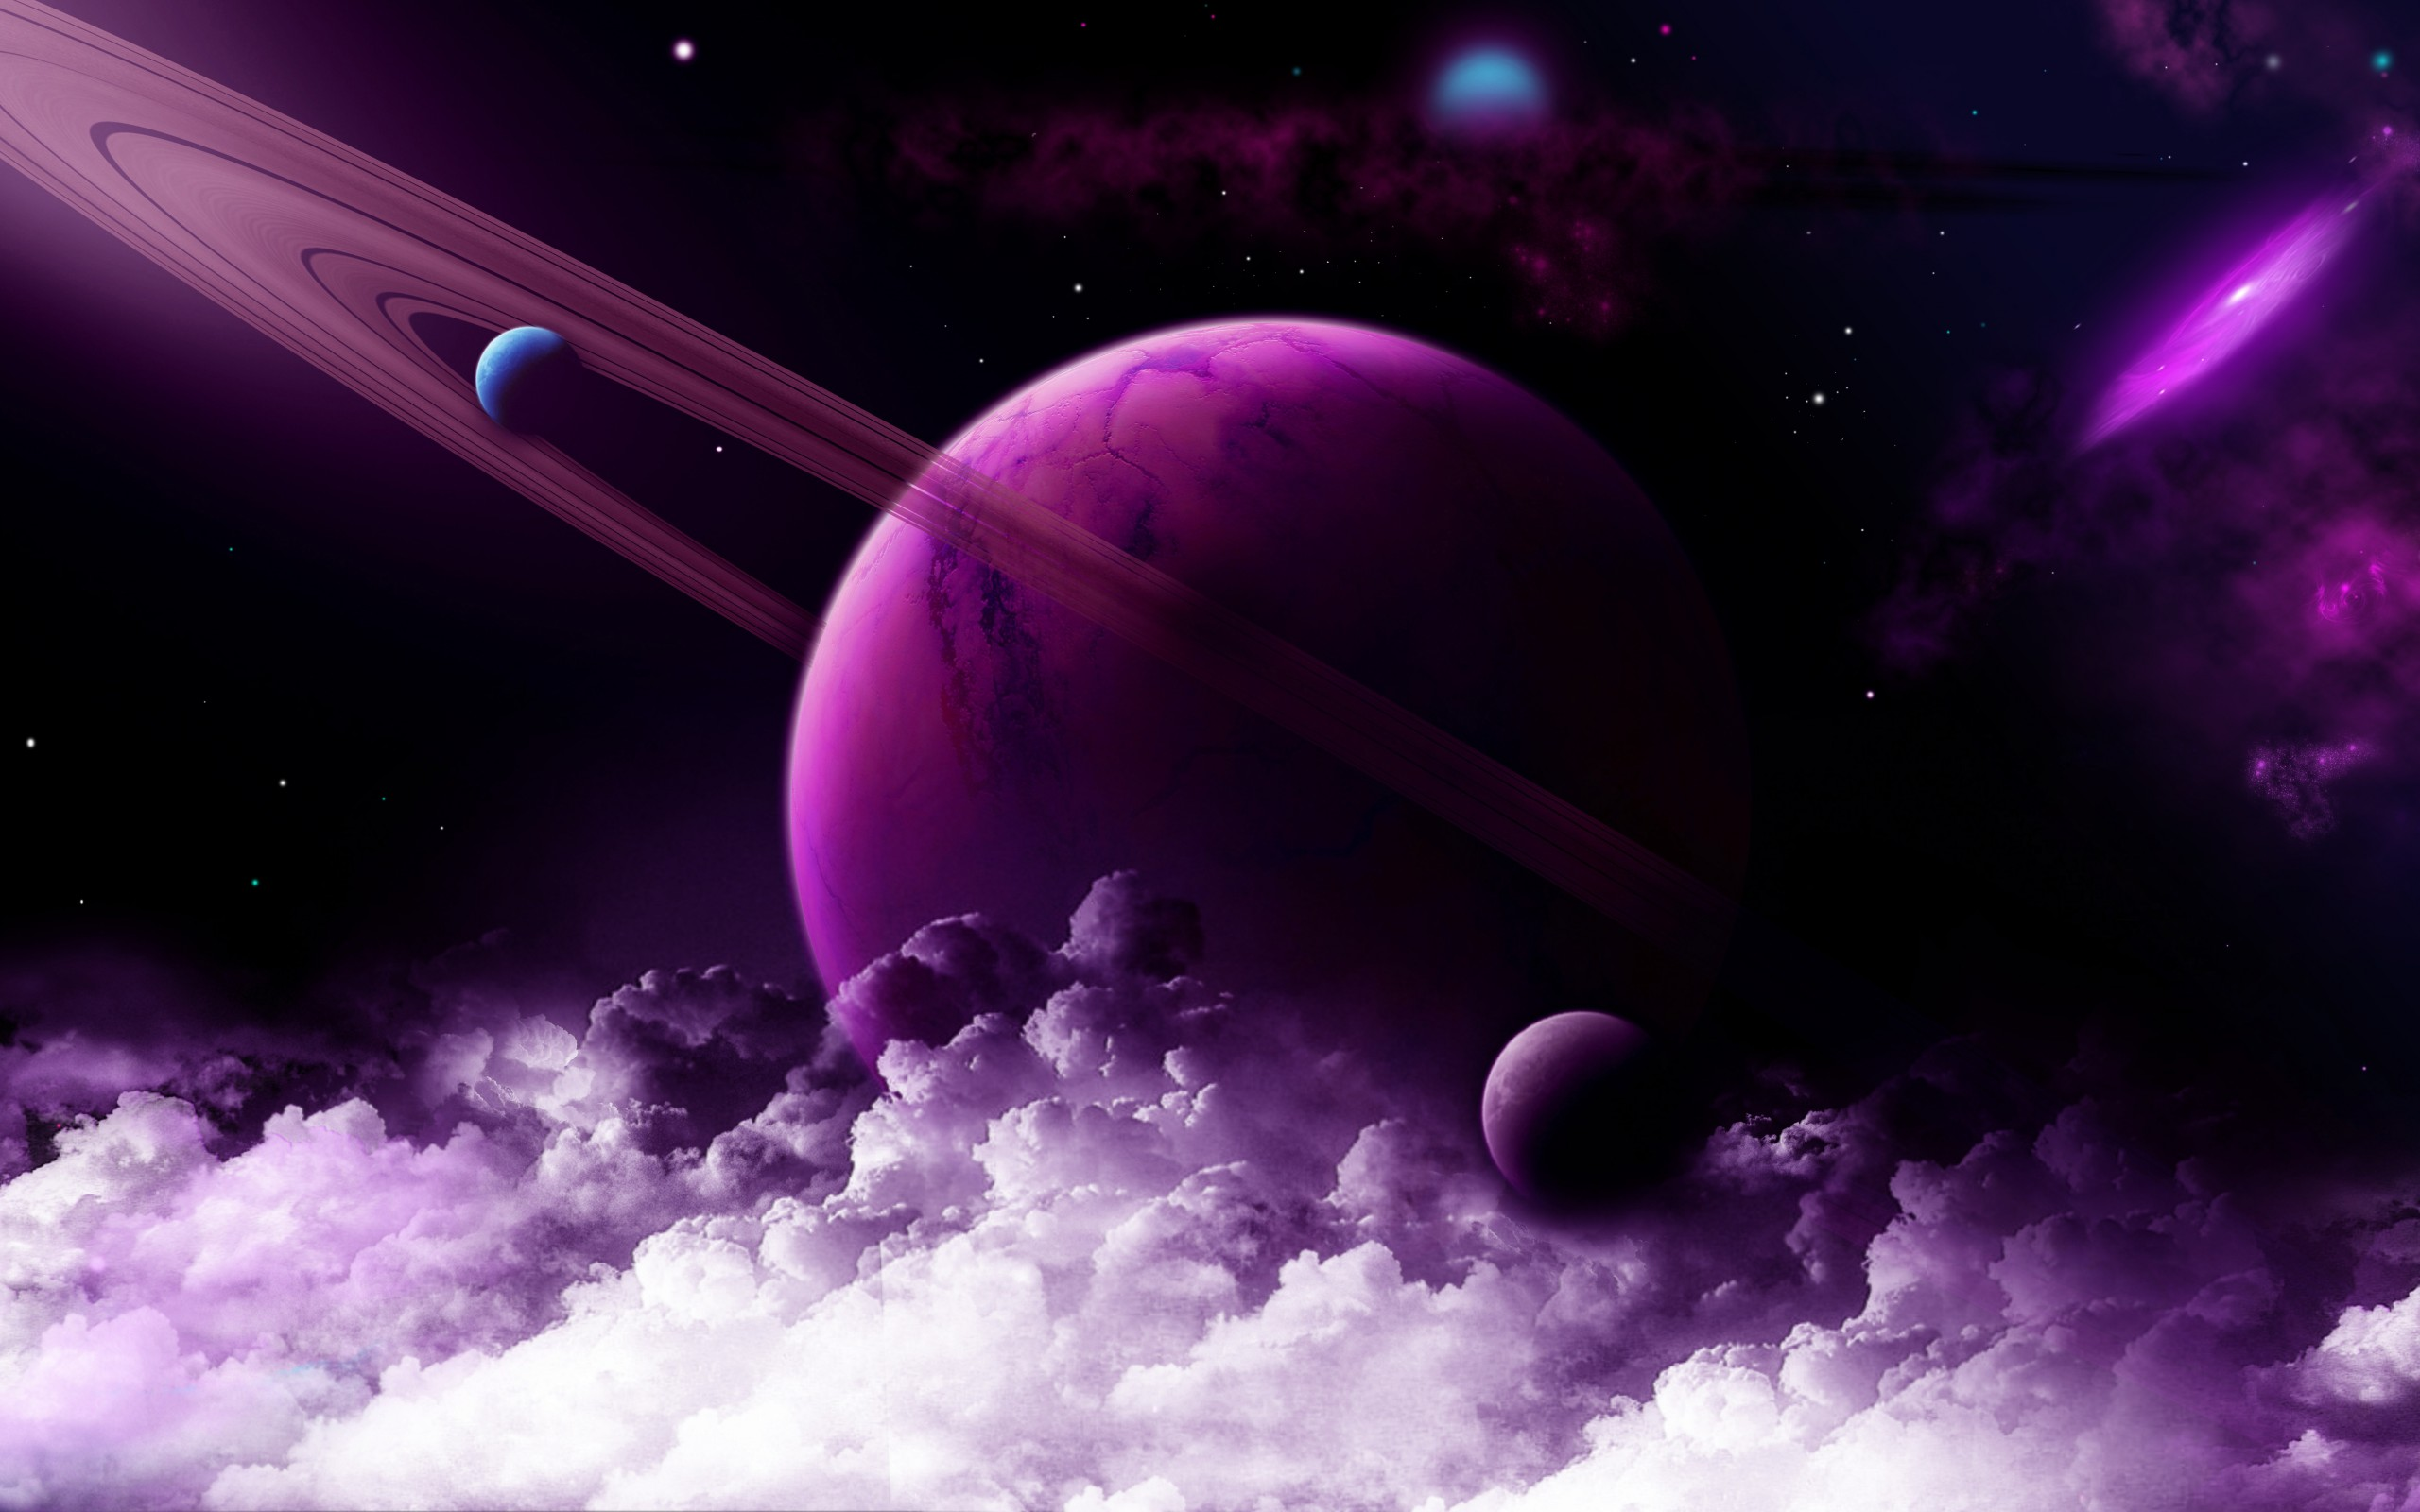 планета, кольца, другой юпитер